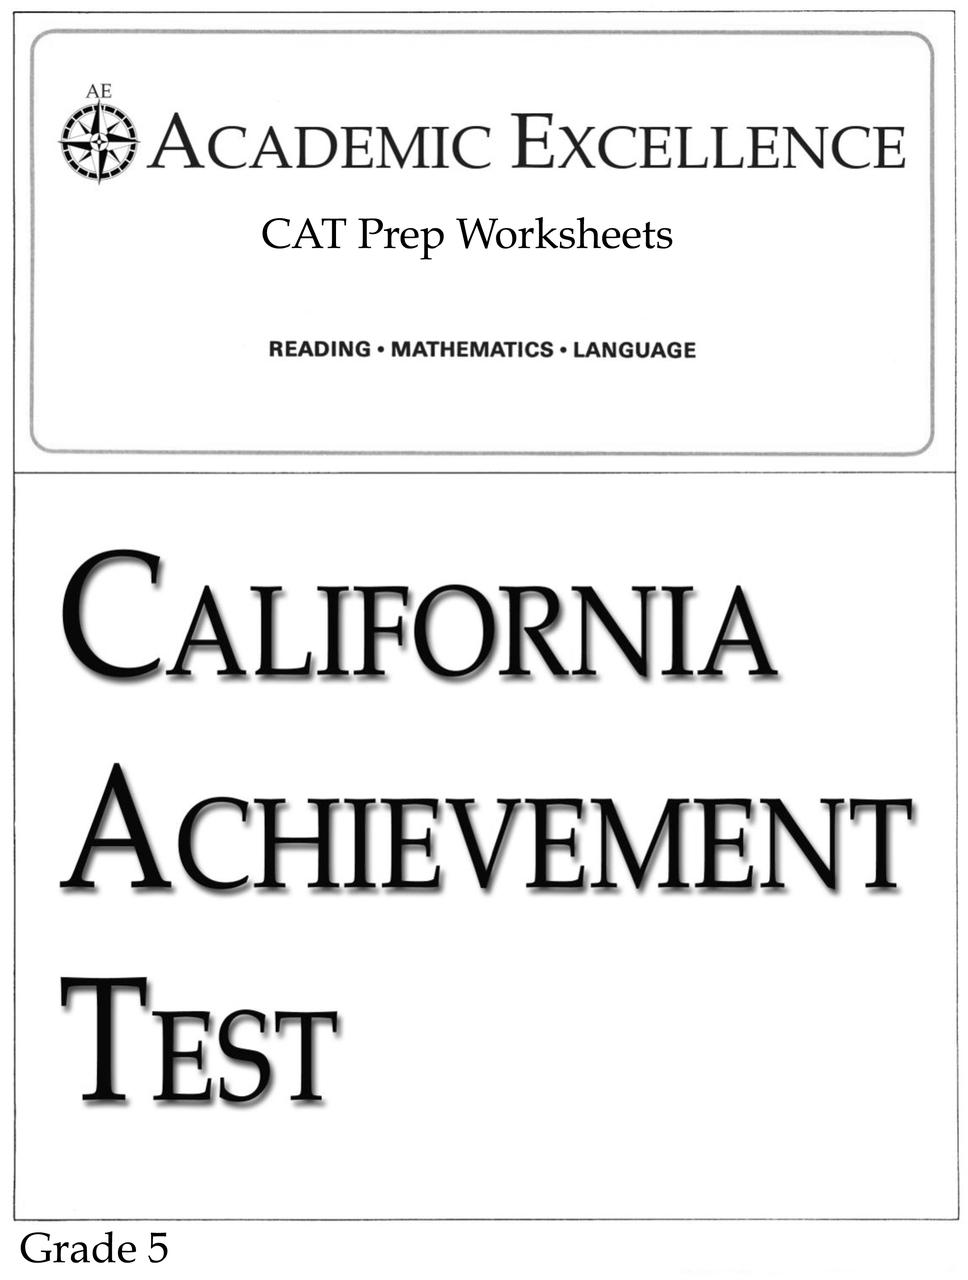 CAT Prep Pack: Grade 5 - PDF Download - Academic Excellence [ 1280 x 968 Pixel ]